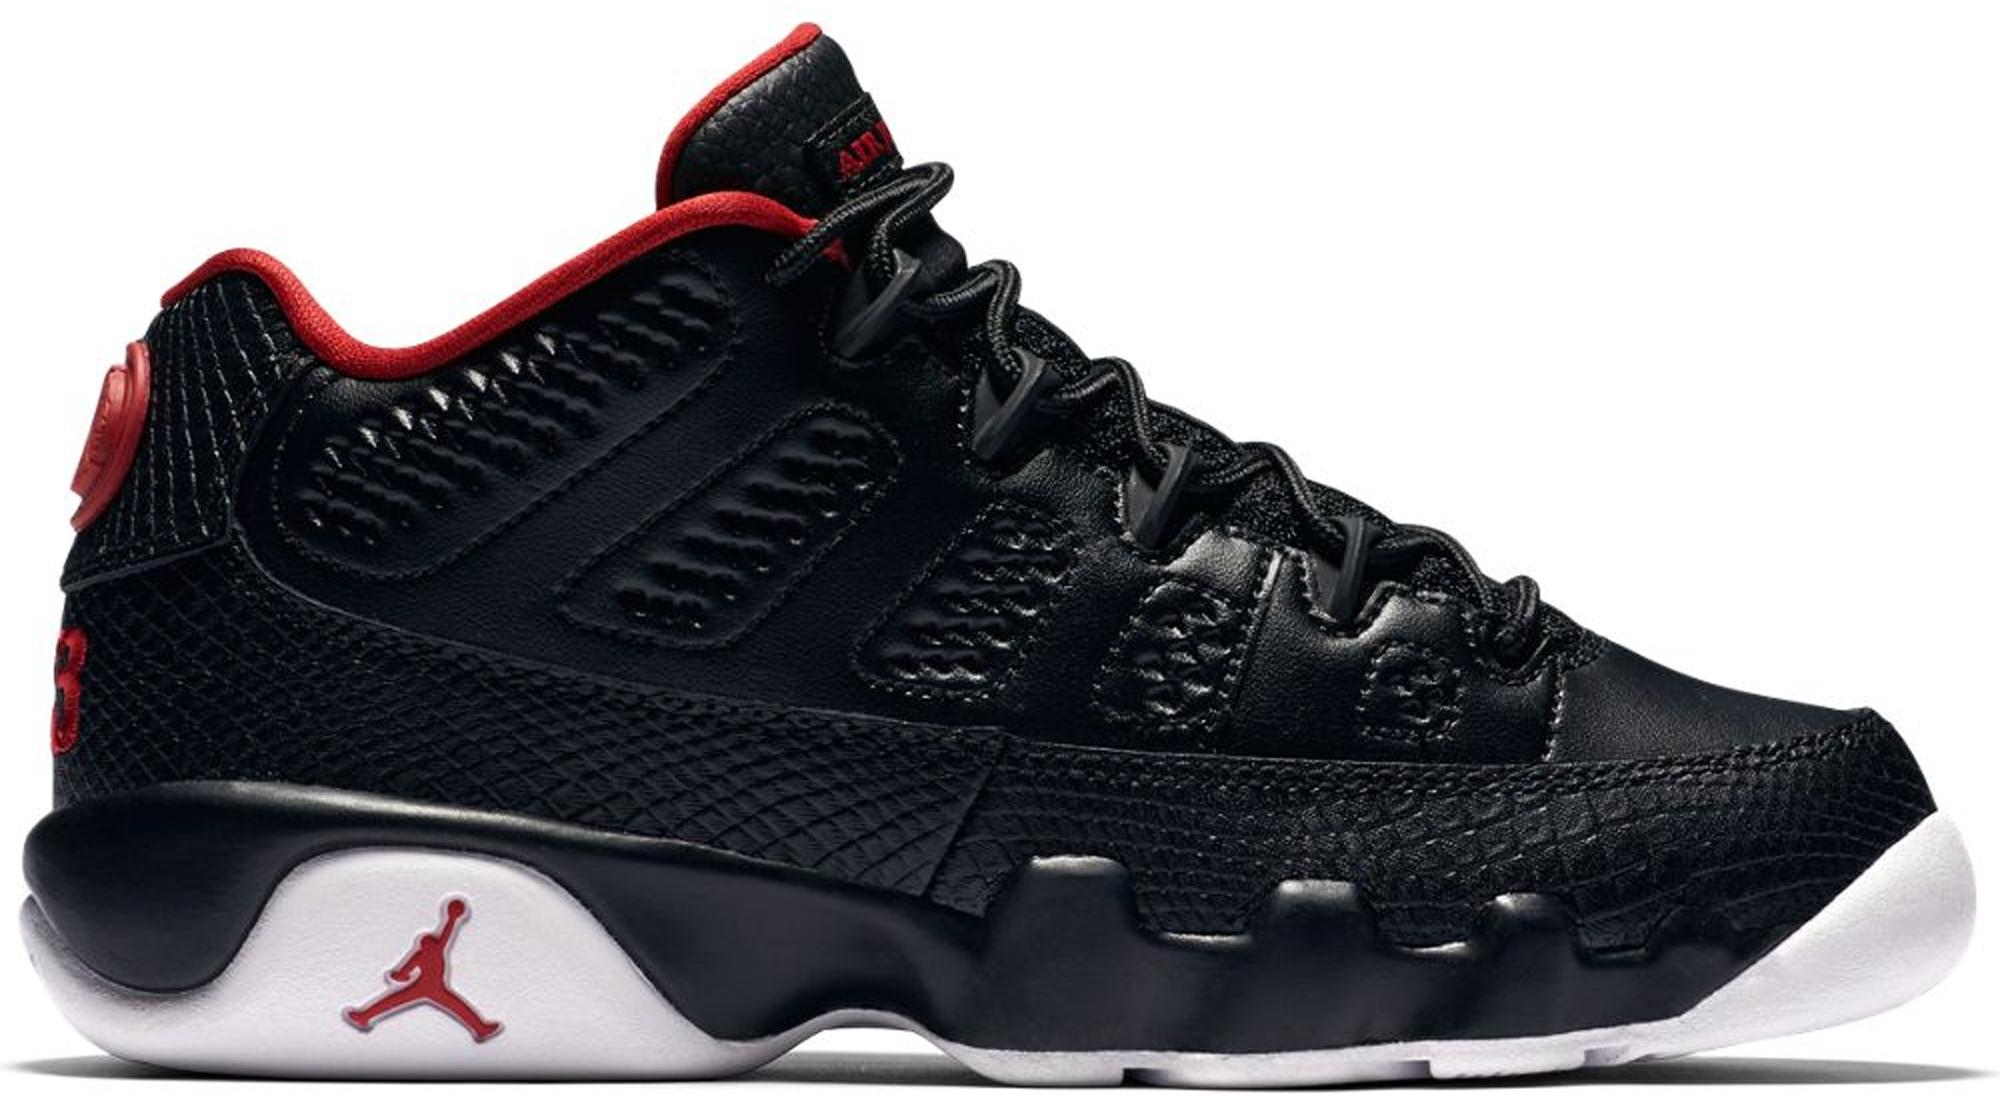 Jordan 9 Retro Low Snakeskin (GS)